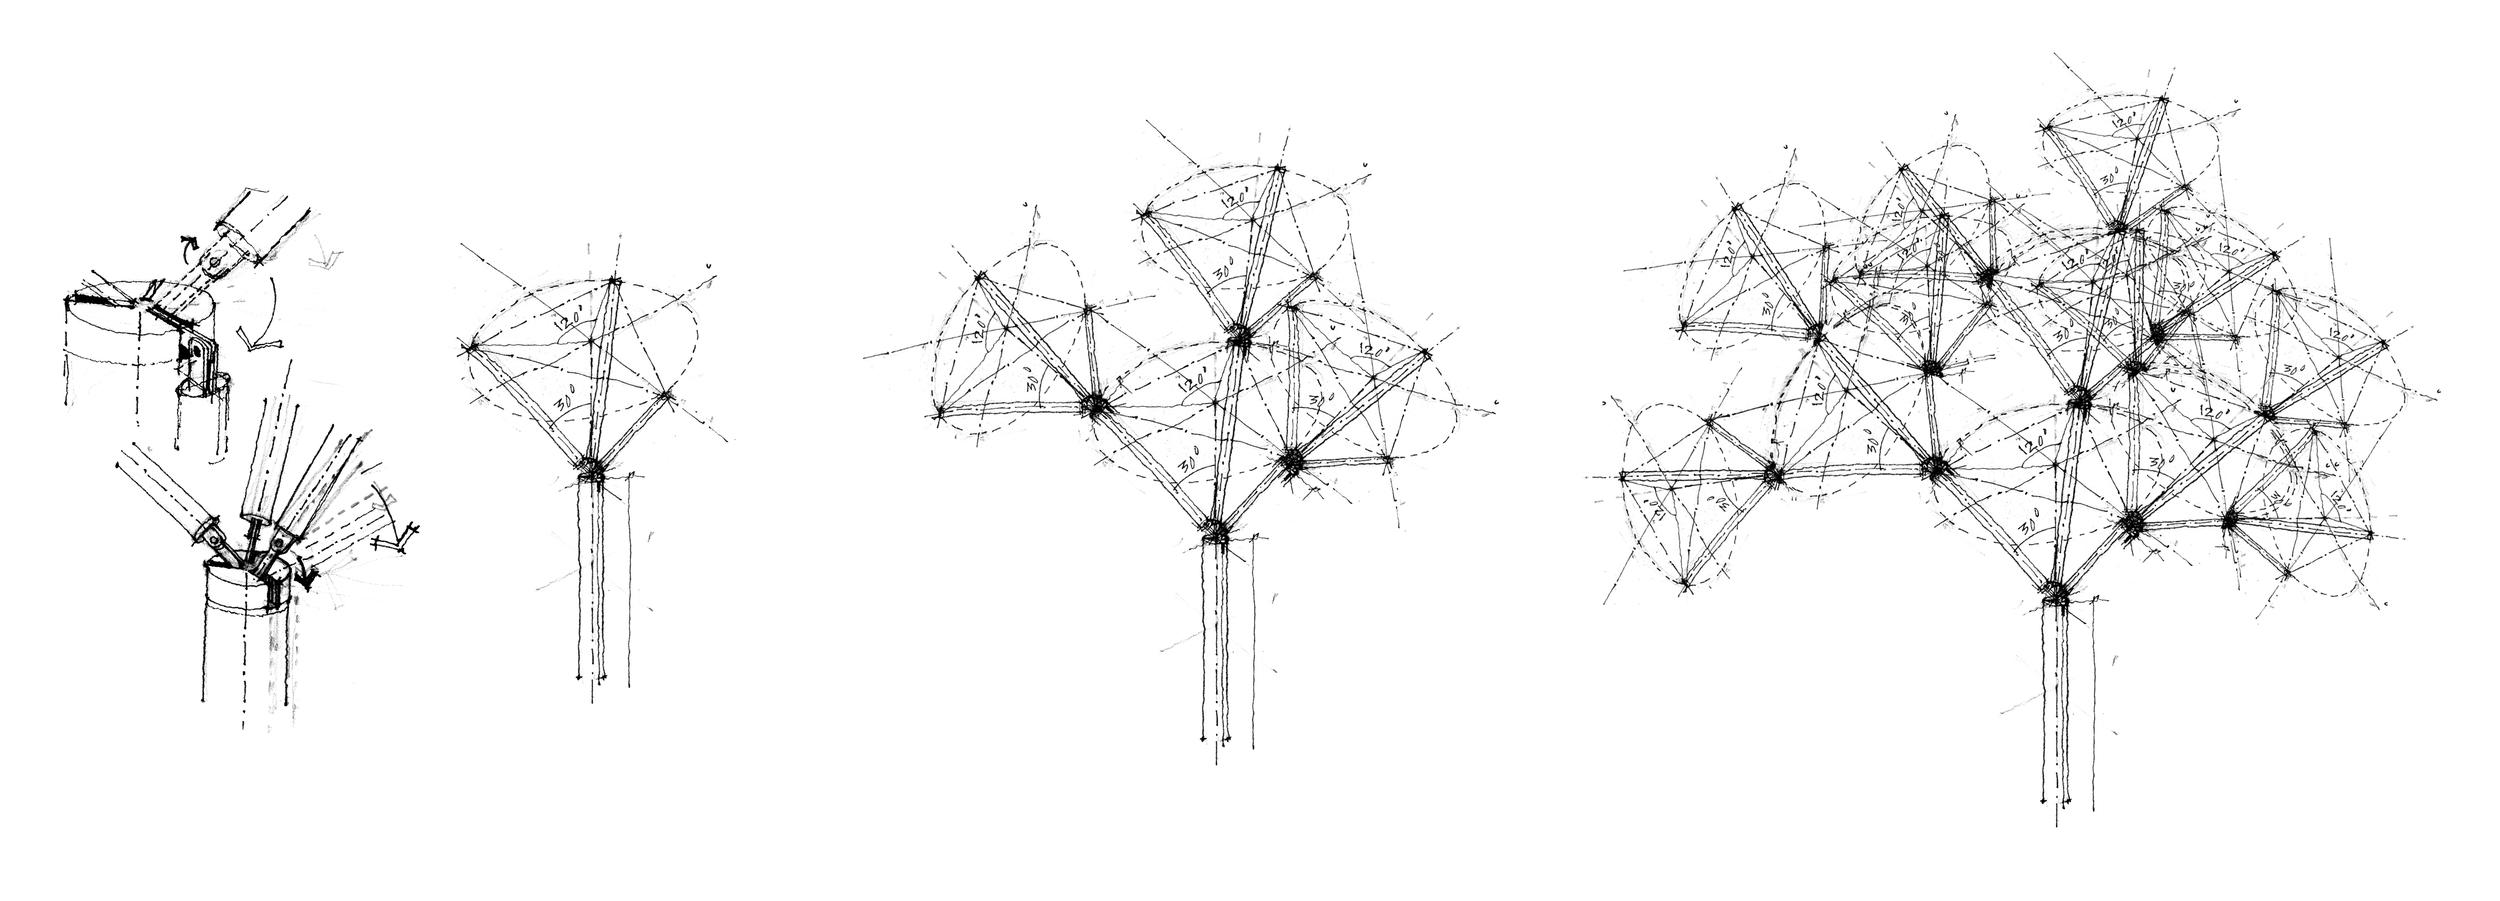 Foldable tree_Process of installing.jpg